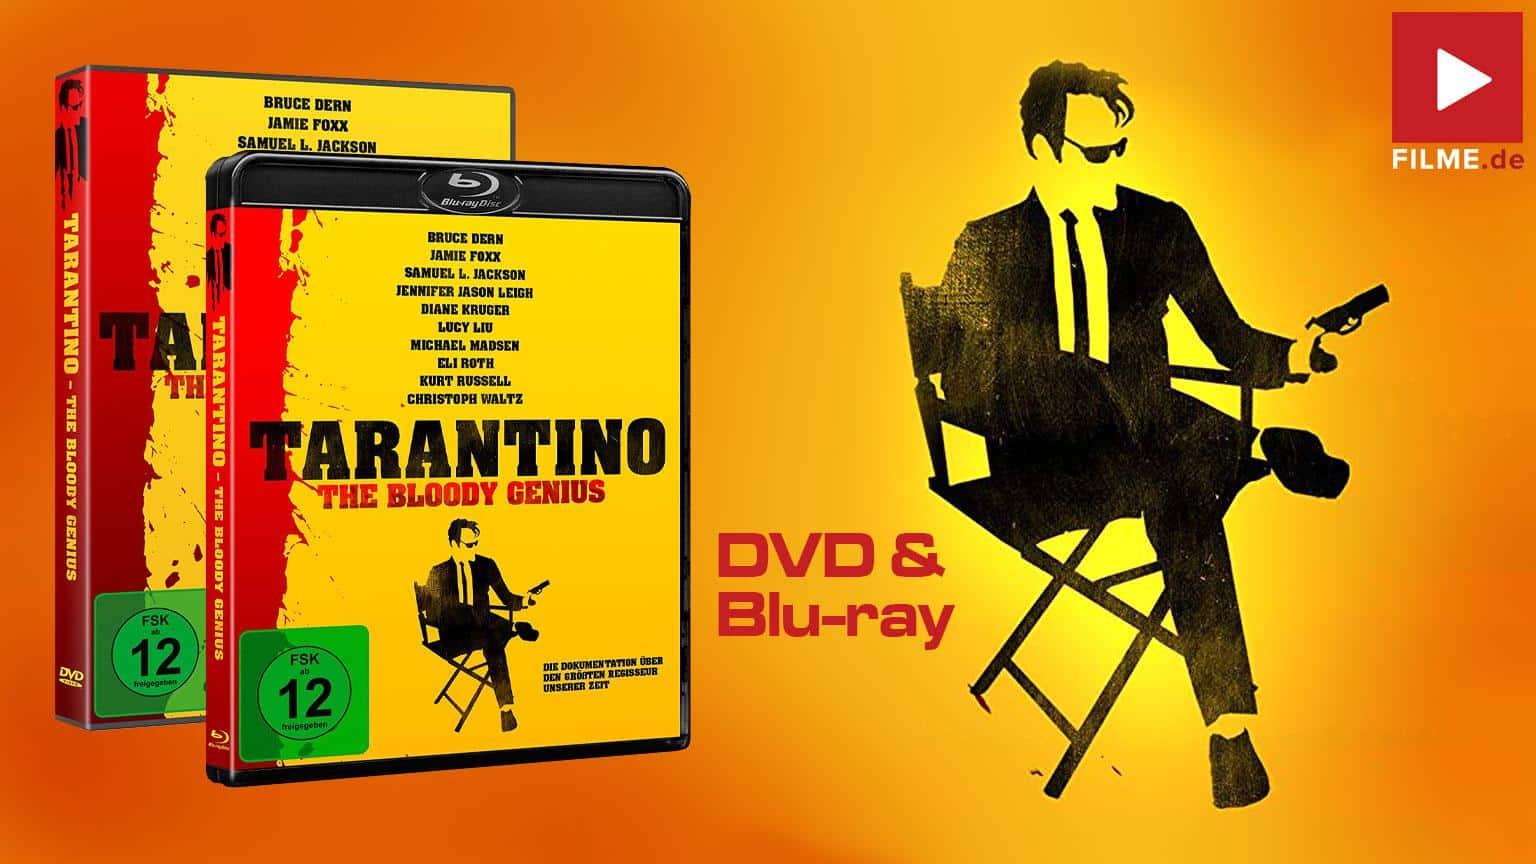 Tarantino the bloody genius gewinnspiel artikelbild